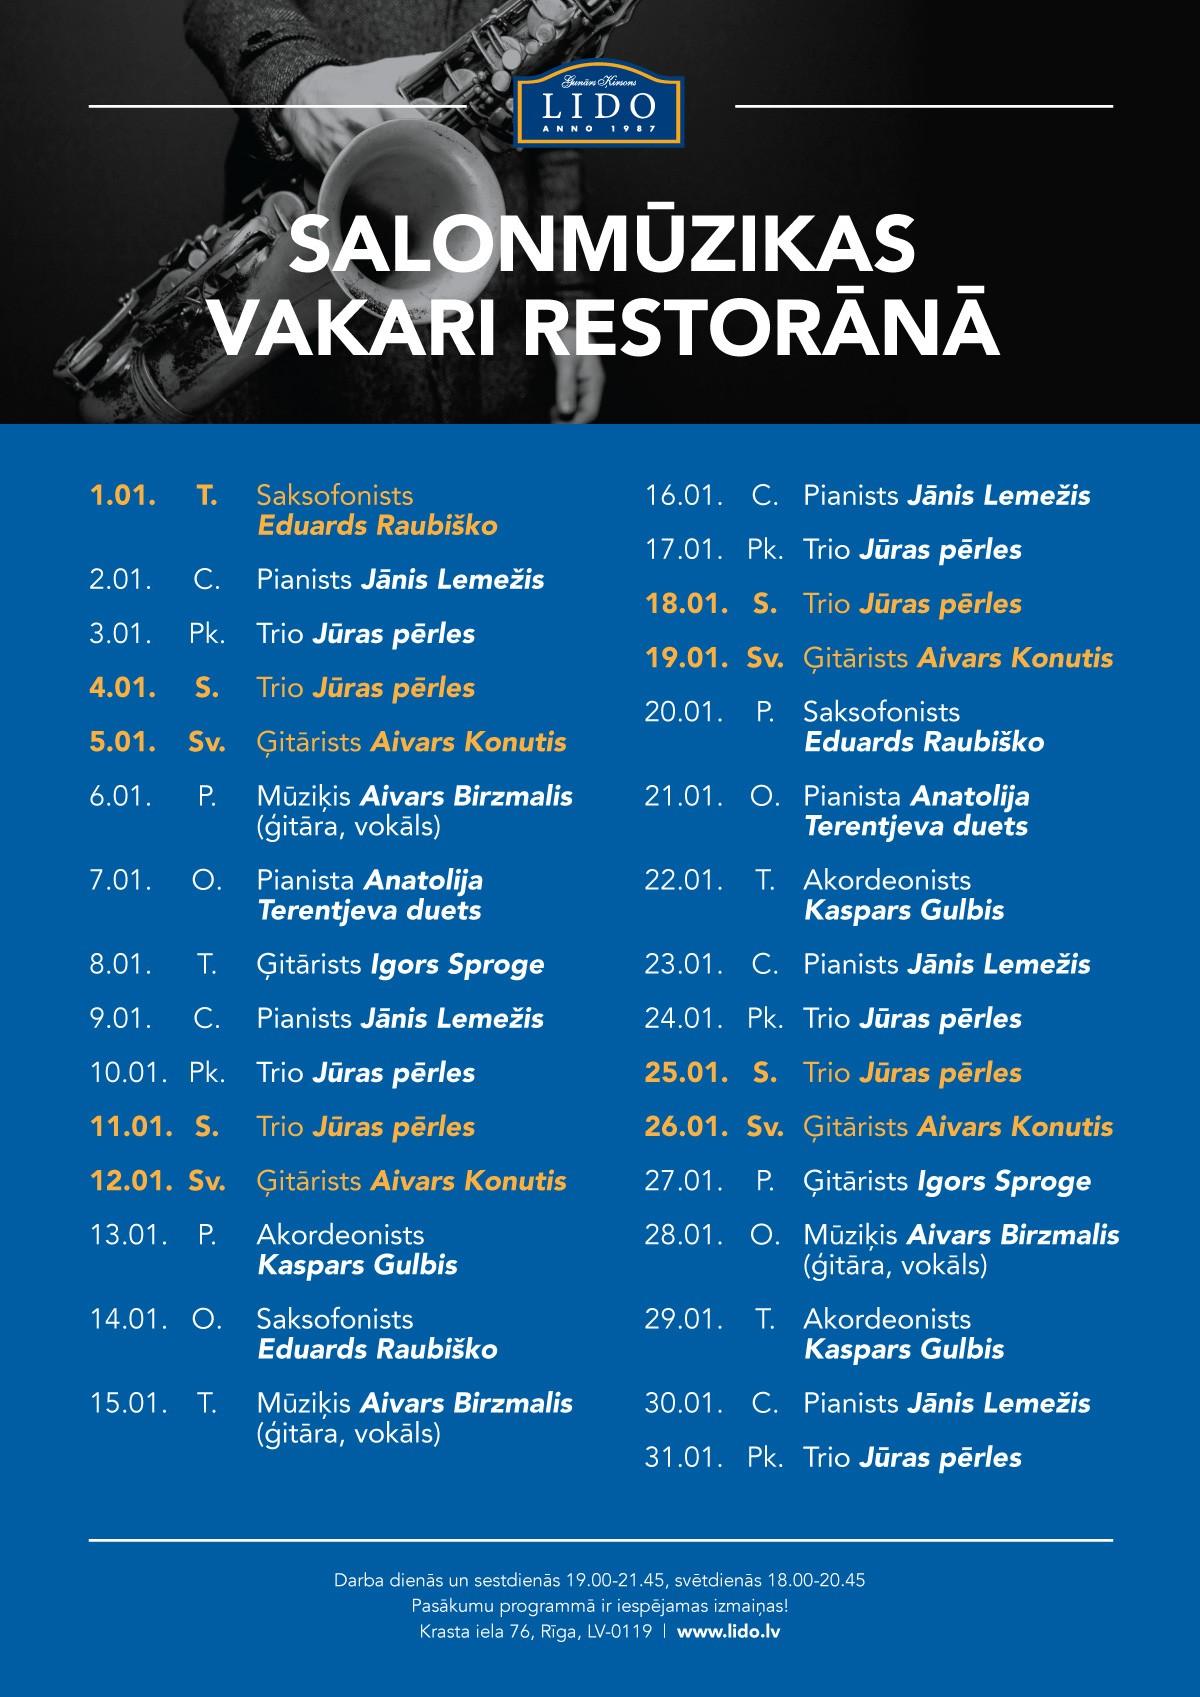 SalonmuzikaRestorans-janvaris-A4-12.2019.jpg